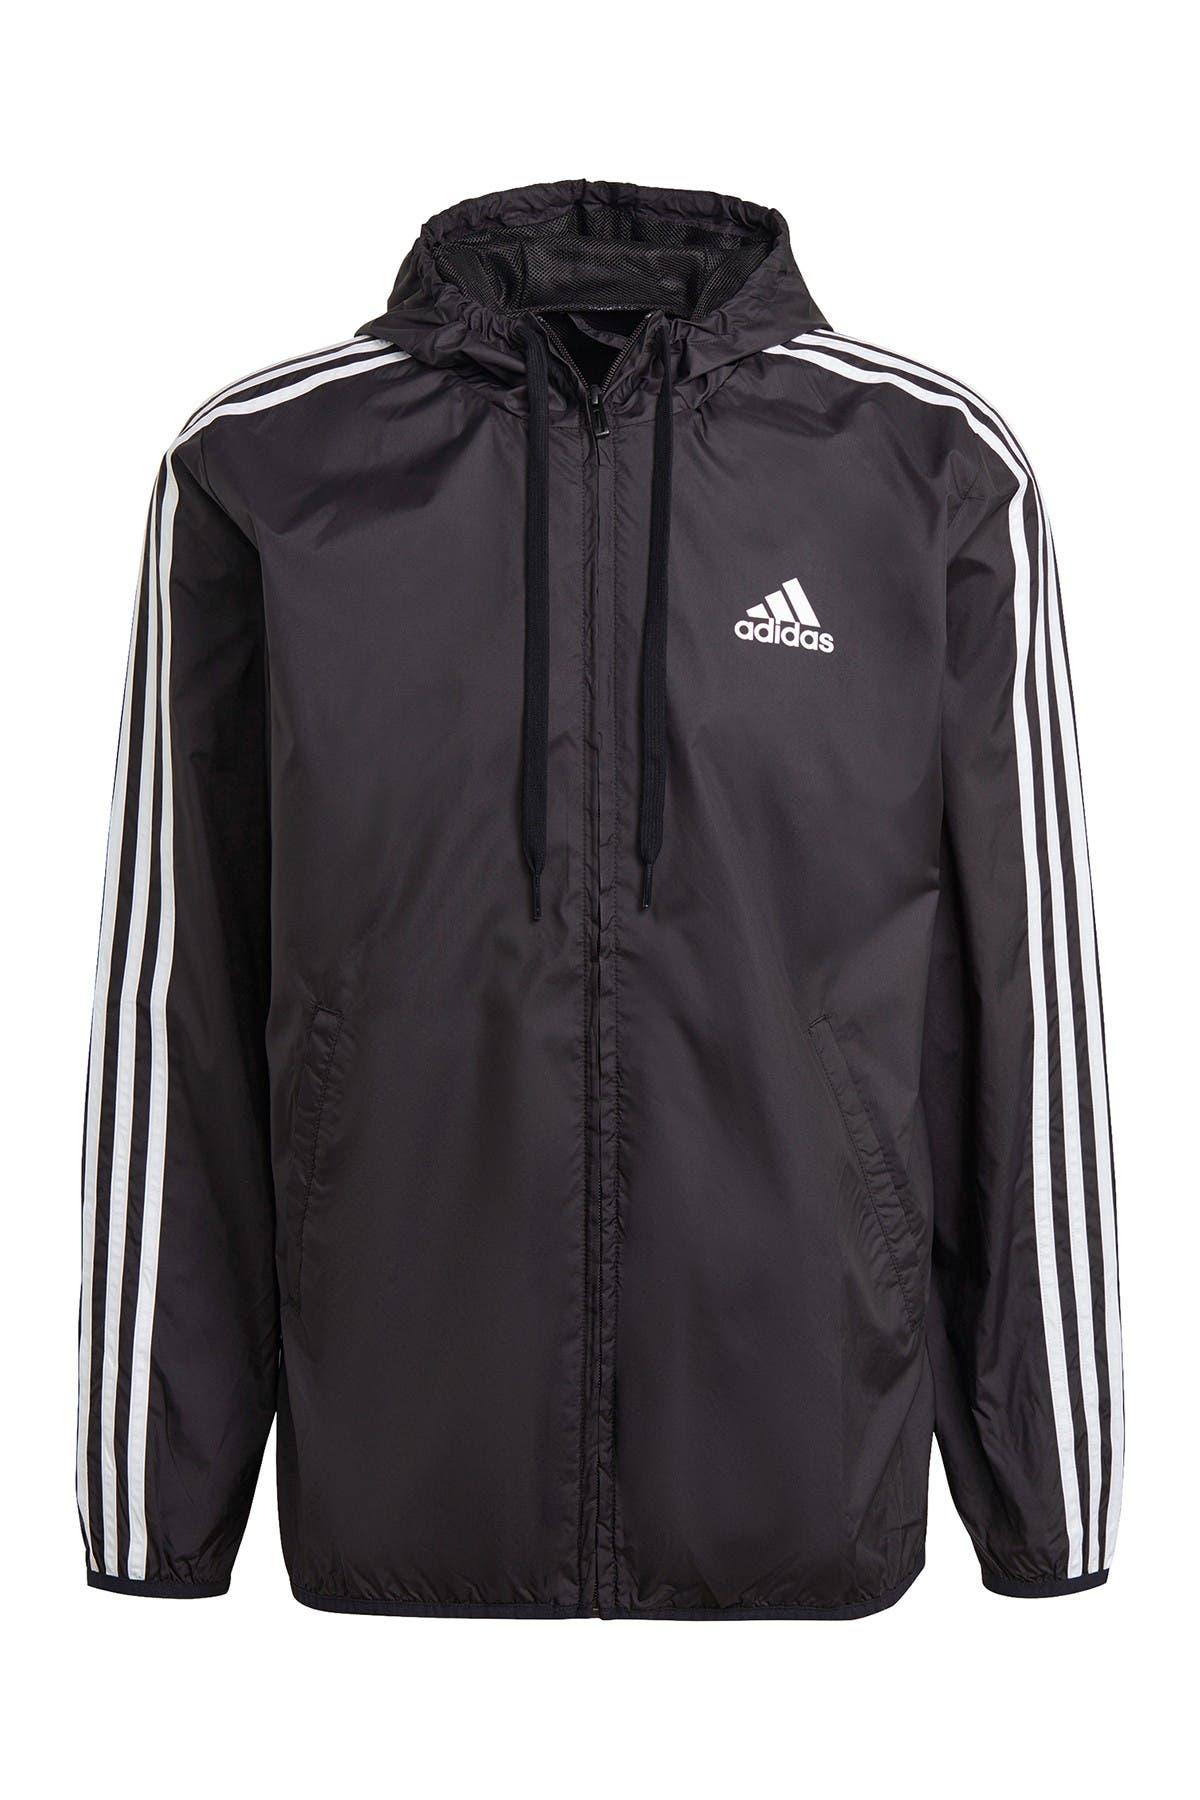 Image of adidas Windbreaker Hooded Jacket